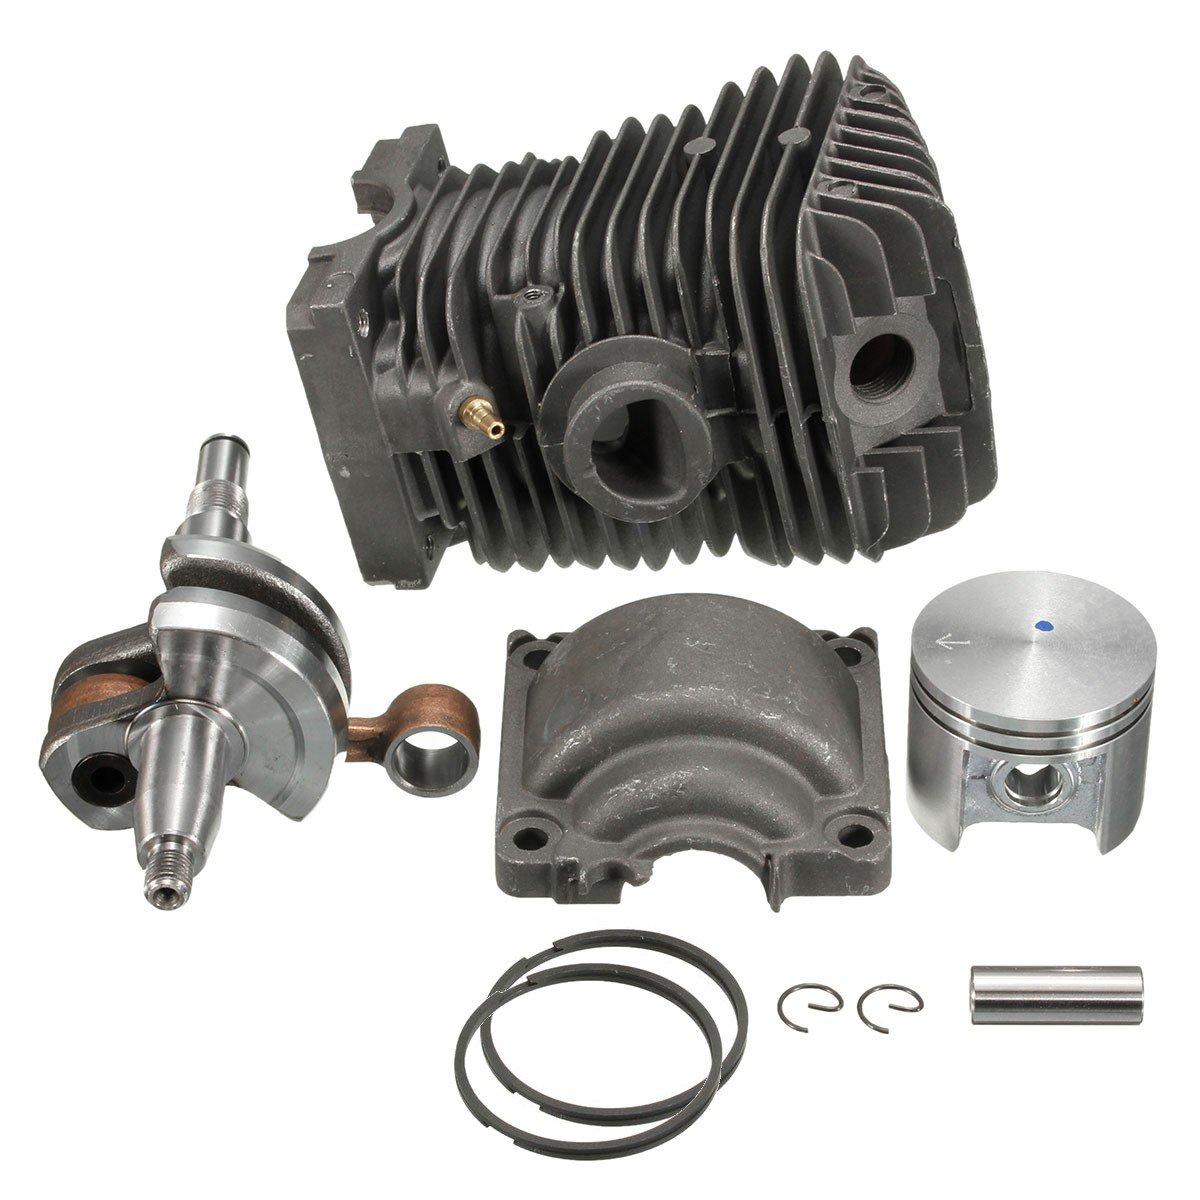 42,5 мм двигатель двигателя для STIHL MS250 цилиндр поршня коленчатого вала цепная пила для Stihl 023 025 MS230 MS25 1123 020 1209